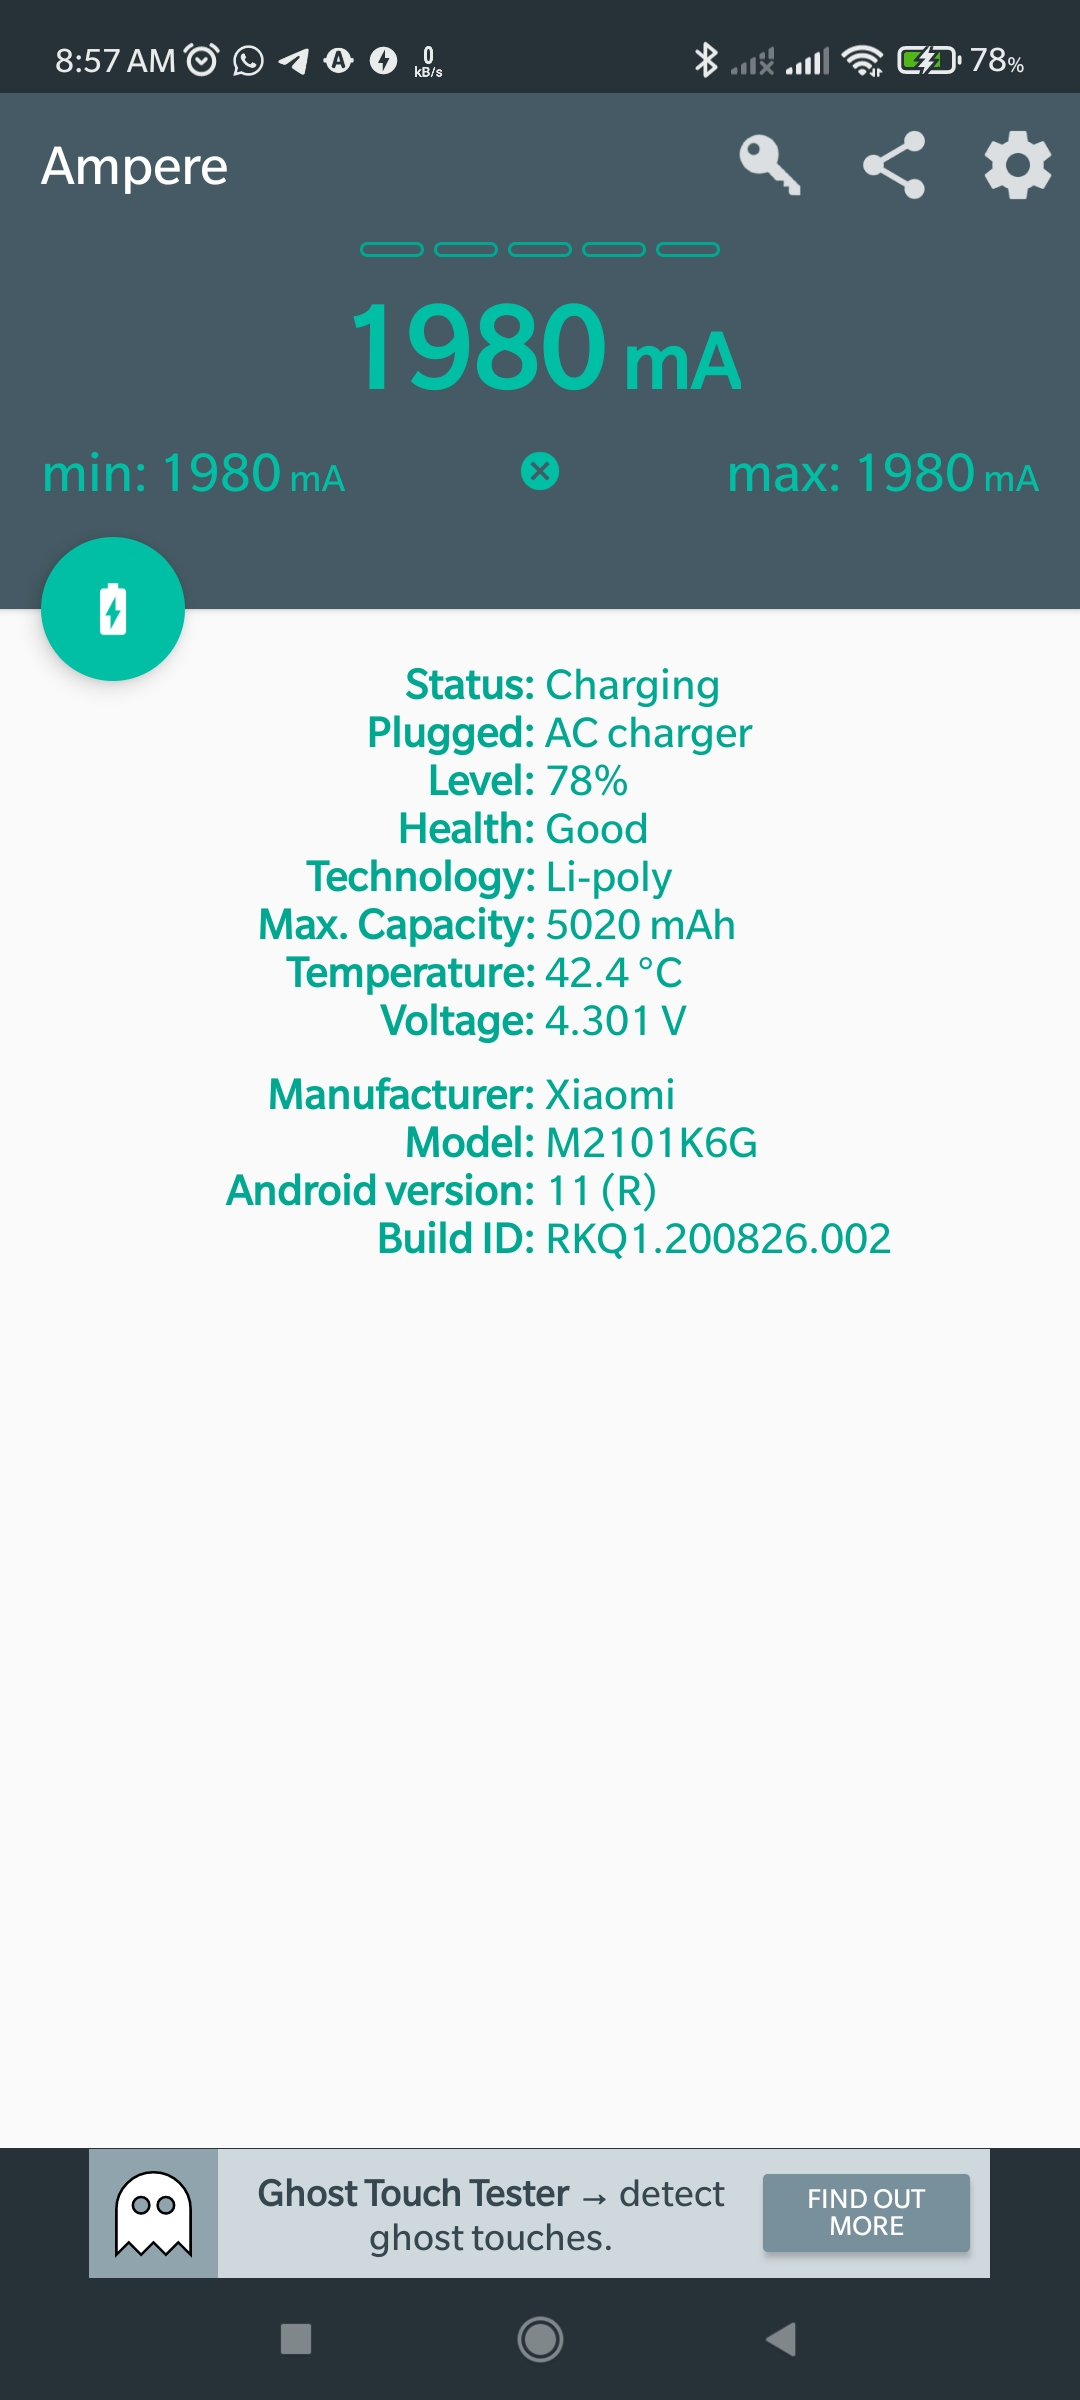 Screenshot_2021-08-19-08-57-51-755_com.gombosdev.ampere.jpg